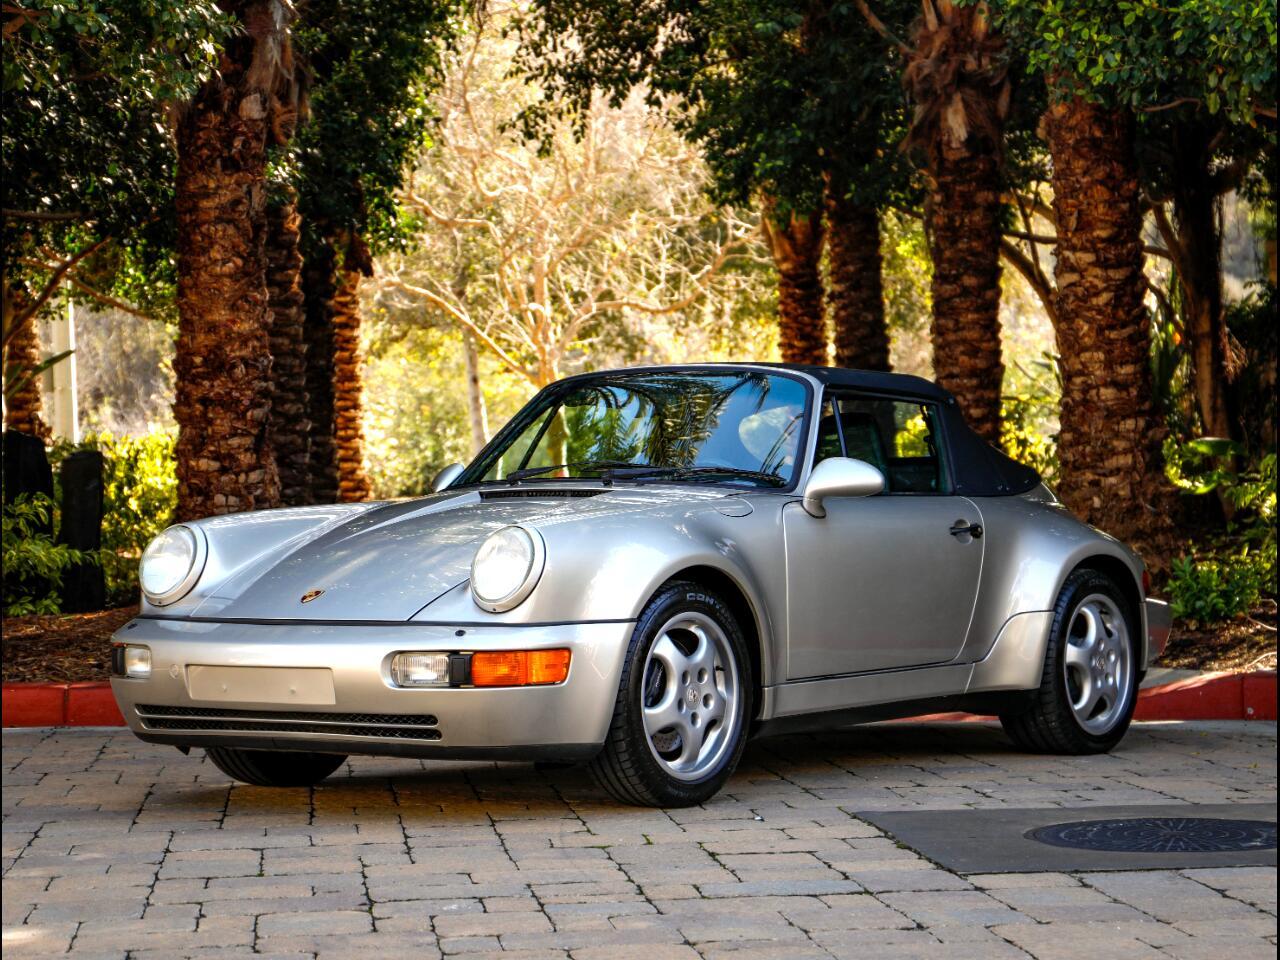 1992 Porsche 964 America Roadster